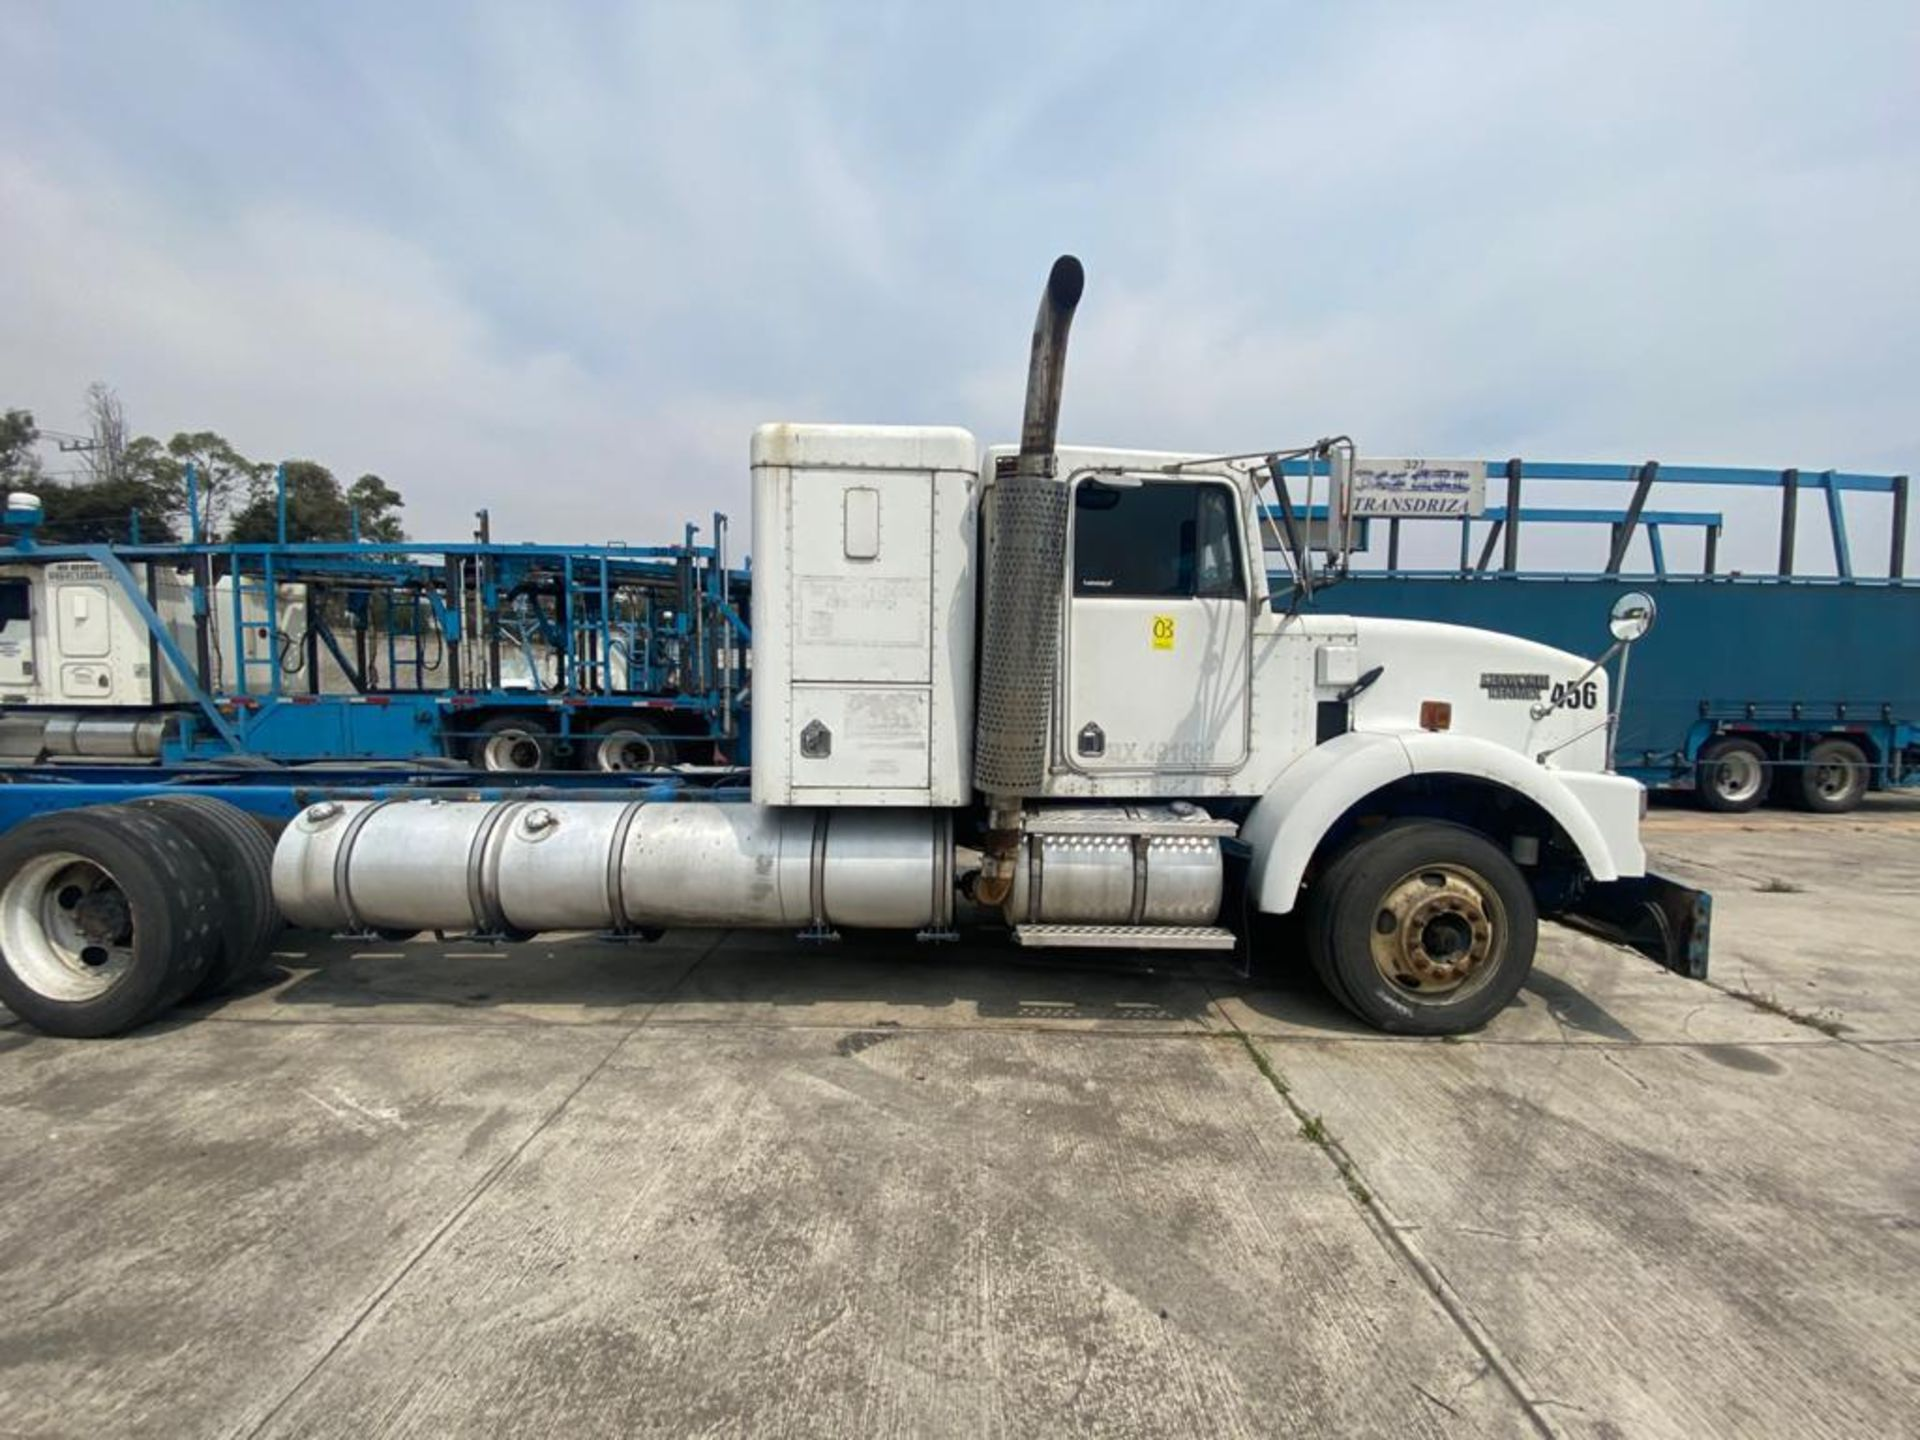 1999 Kenworth Sleeper truck tractor, standard transmission of 18 speeds - Image 22 of 62